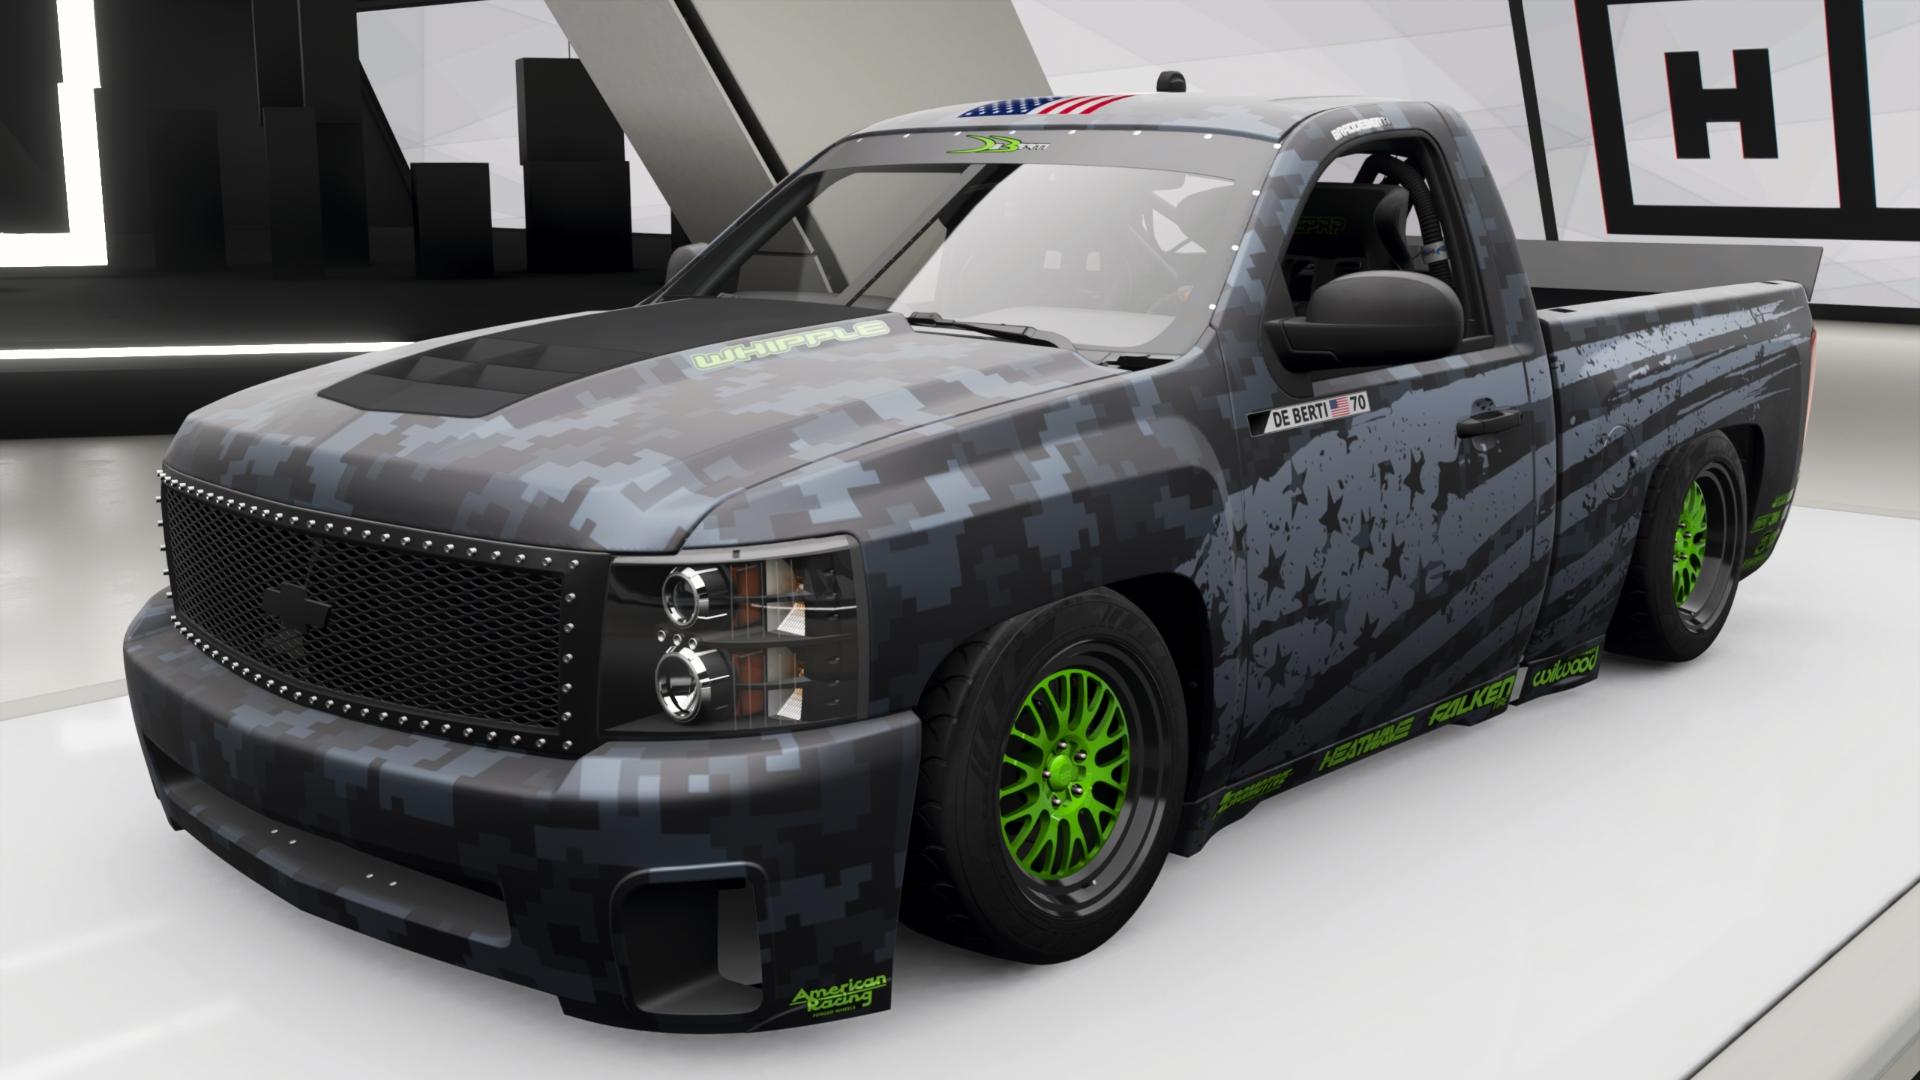 Image result for brad deberti drift truck forza